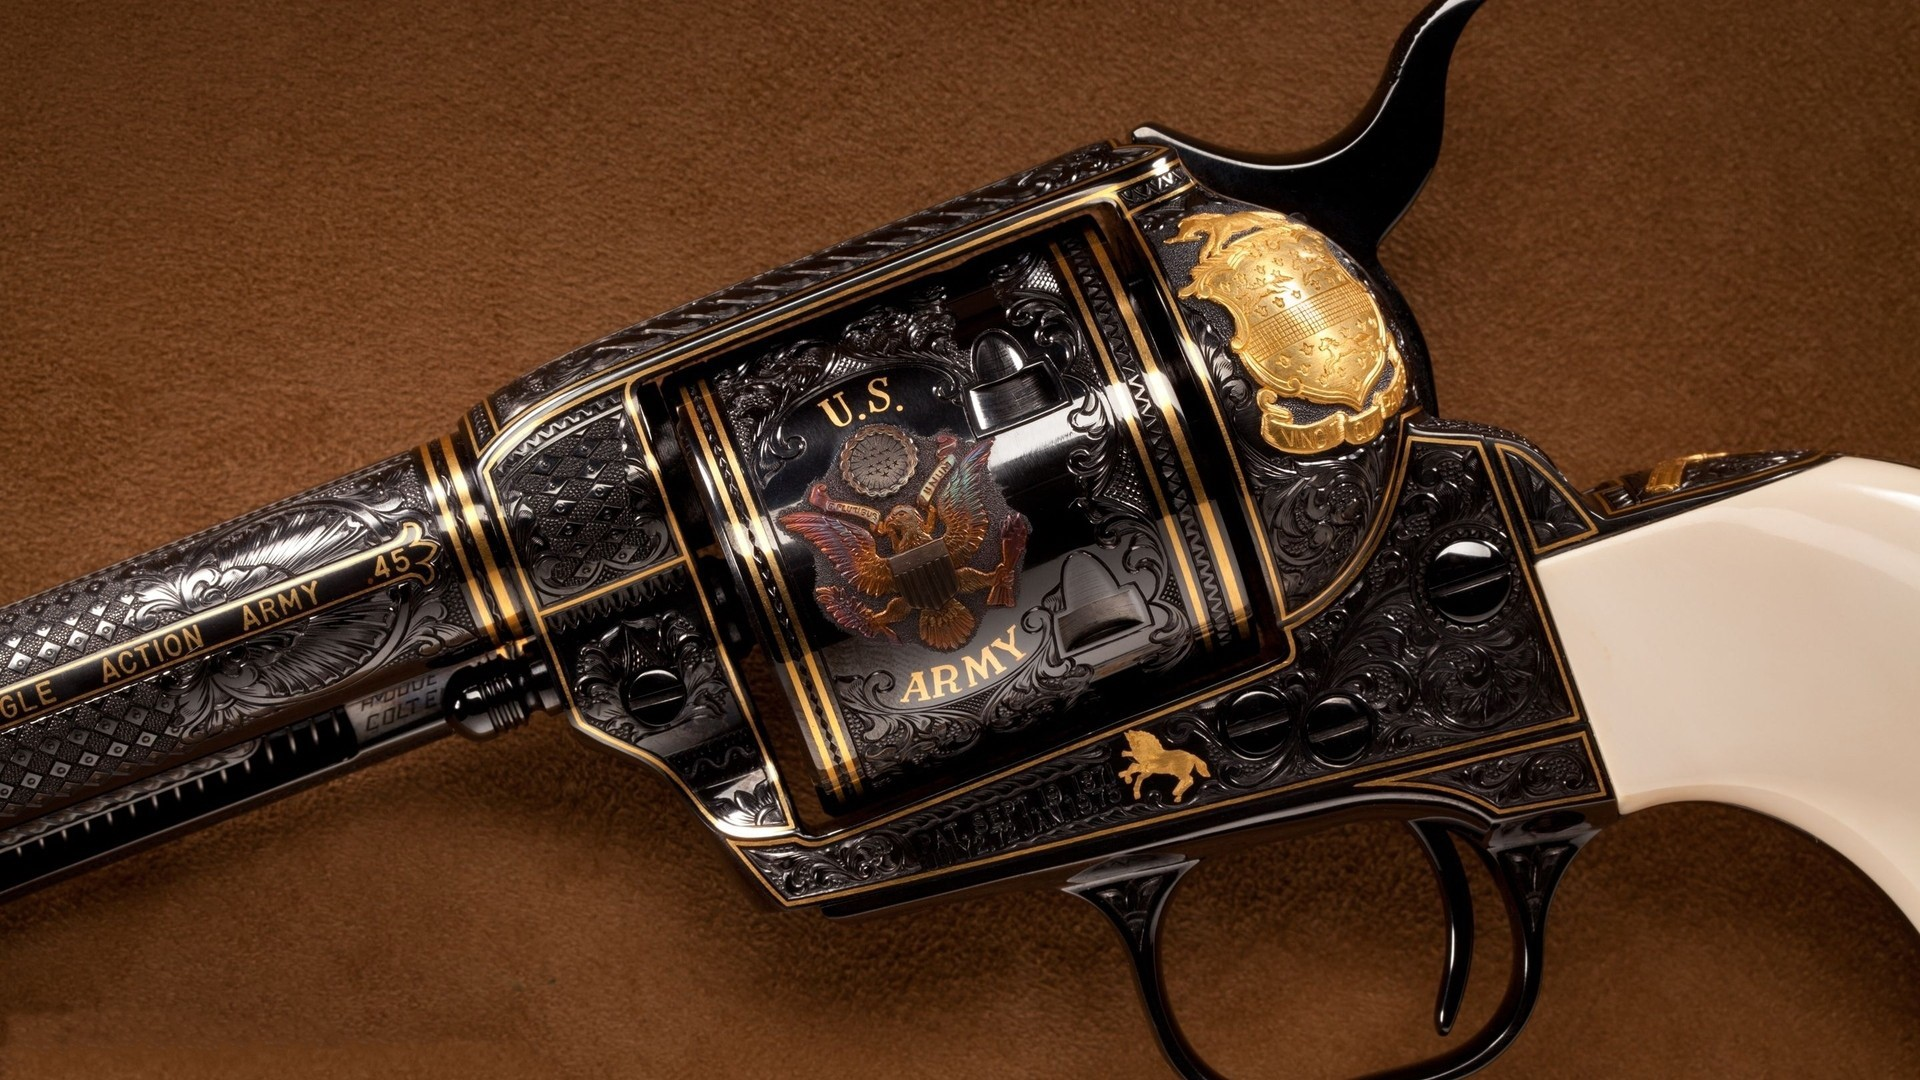 Colt Hand Gun Revolver HD Desktop Images HD Wallpapers 1920x1080